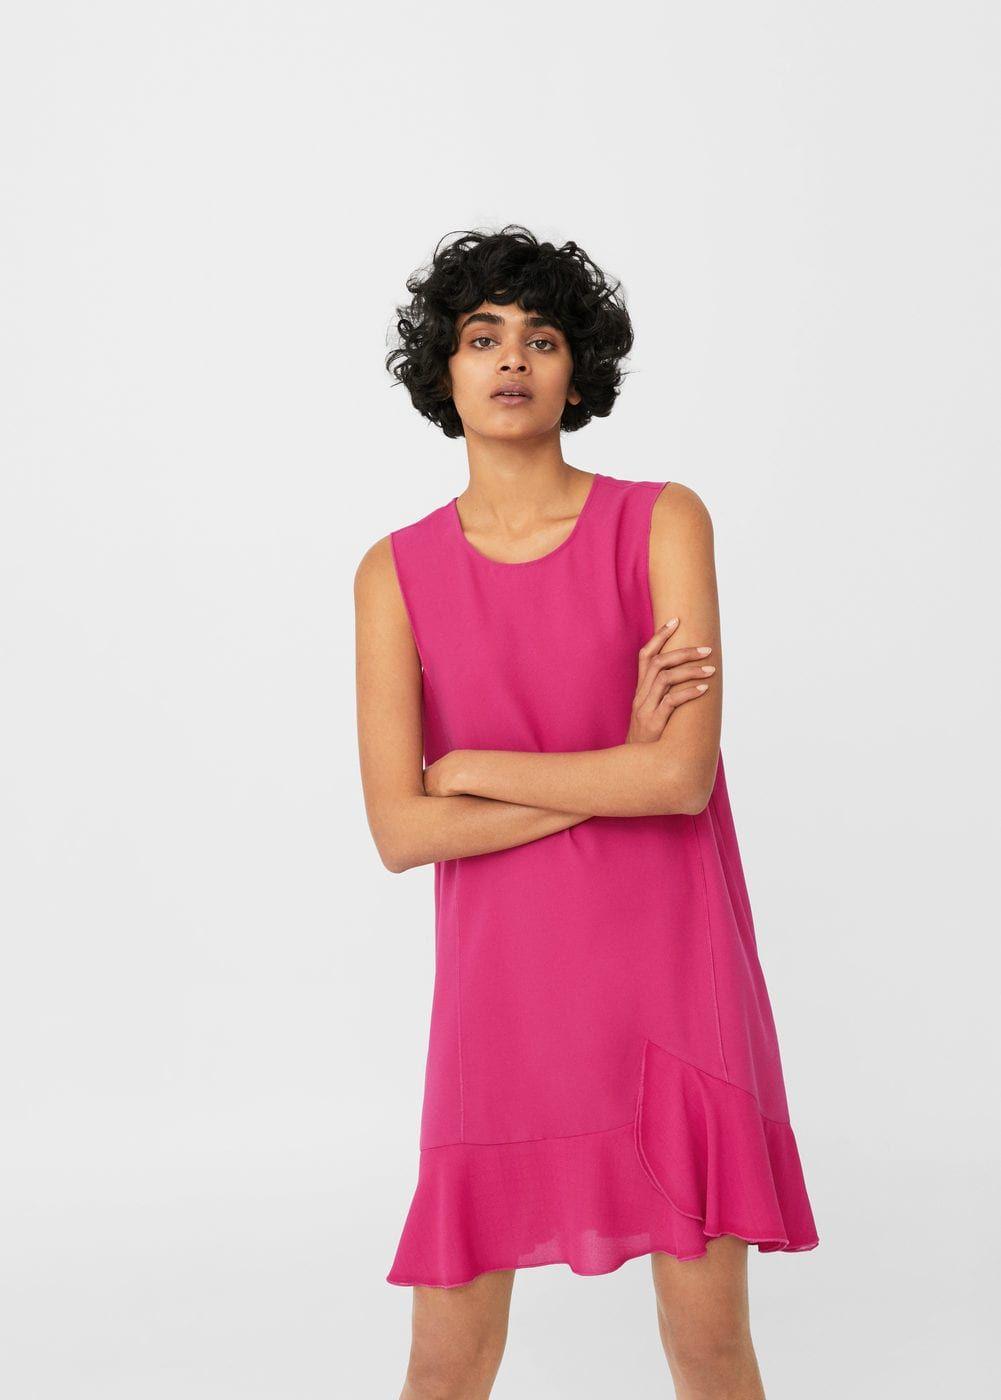 758862169008 Flowy ruffled dress - Women | Style | Ruffle dress, Dresses, Dress ...